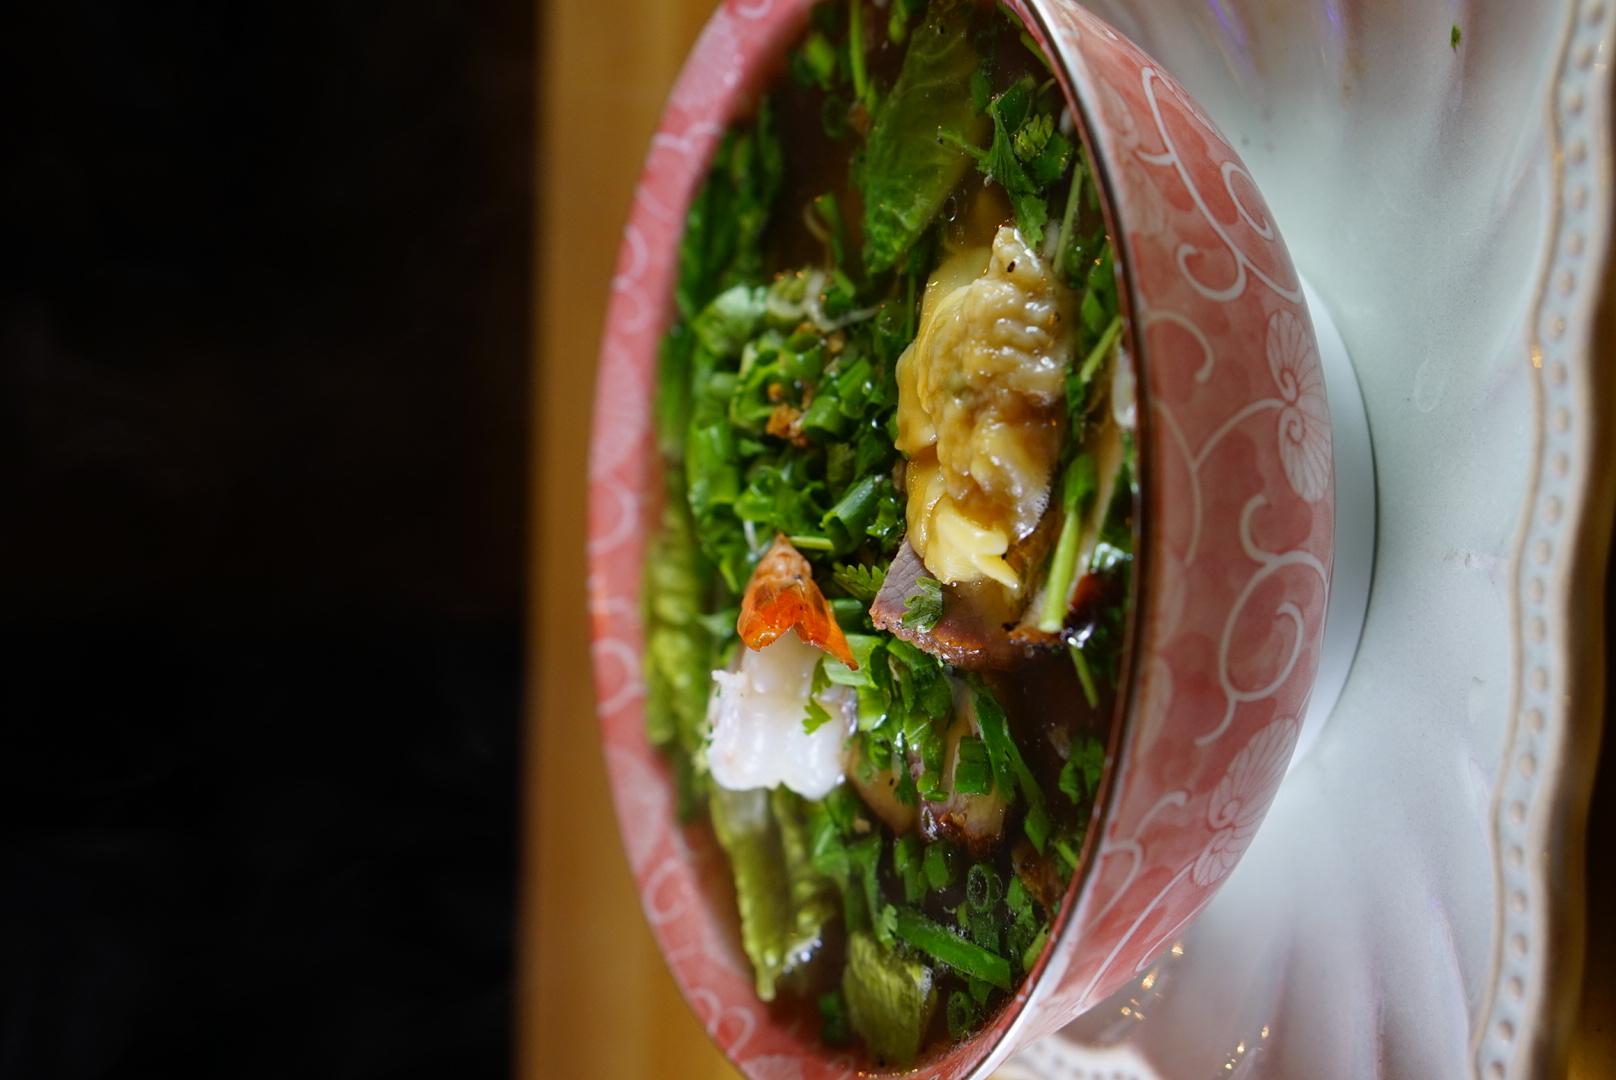 Mi Hoanh Thanh